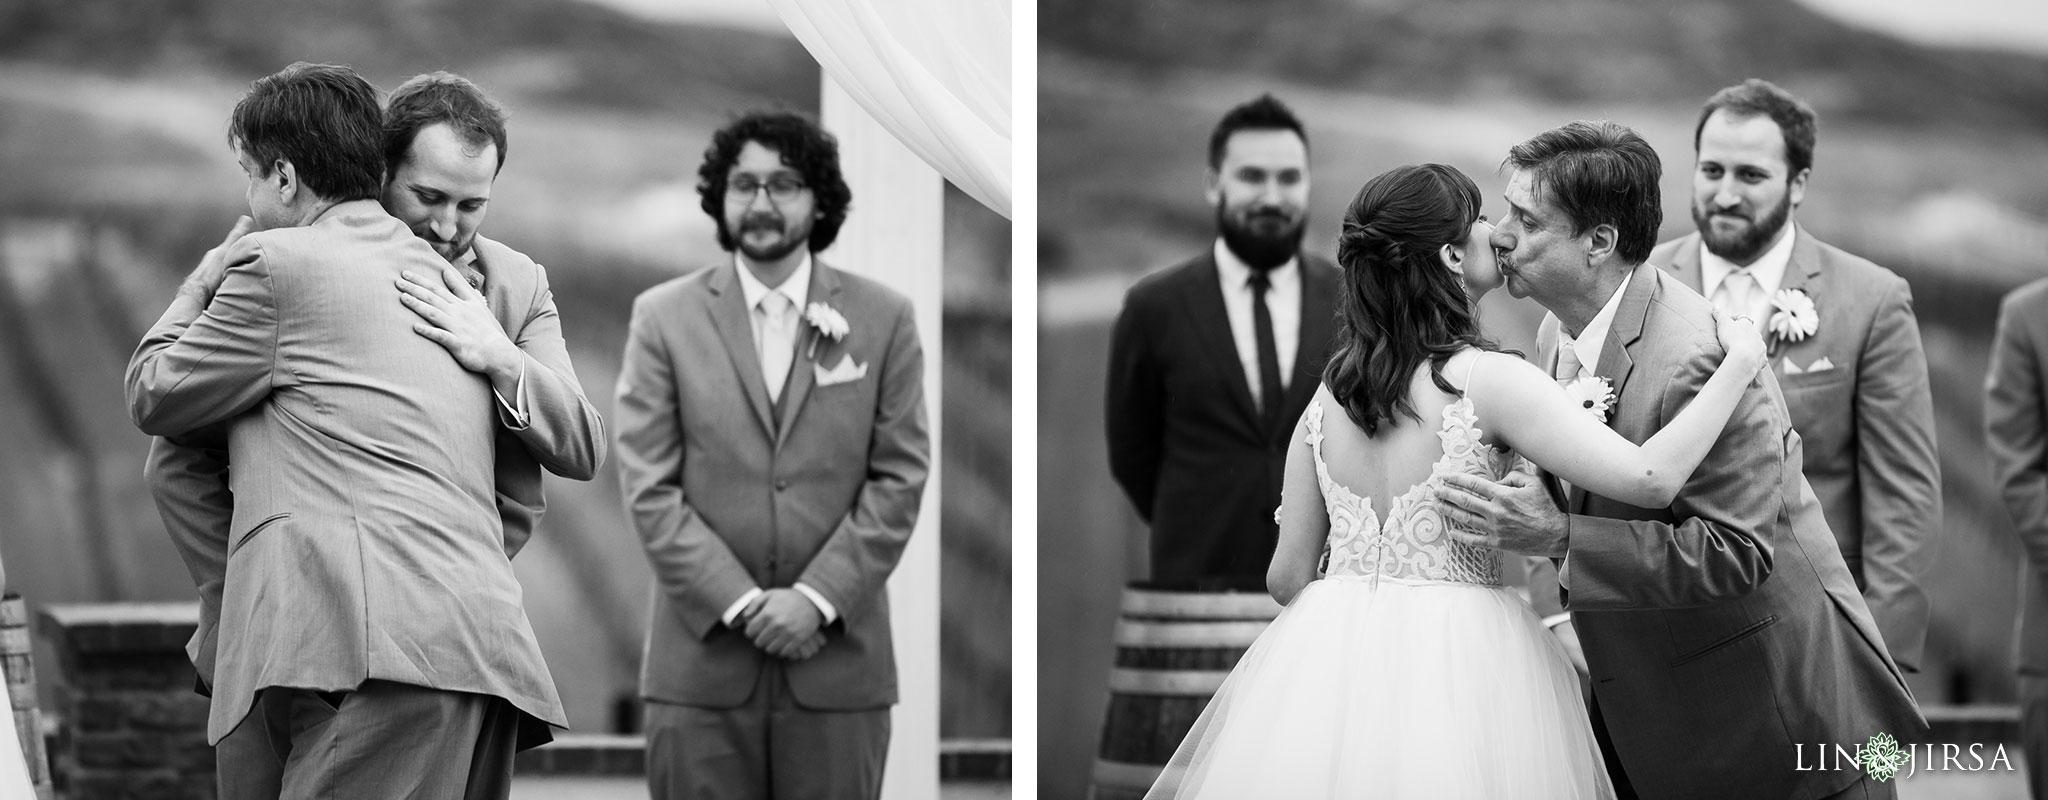 23 leoness cellars temecula wedding ceremony photography